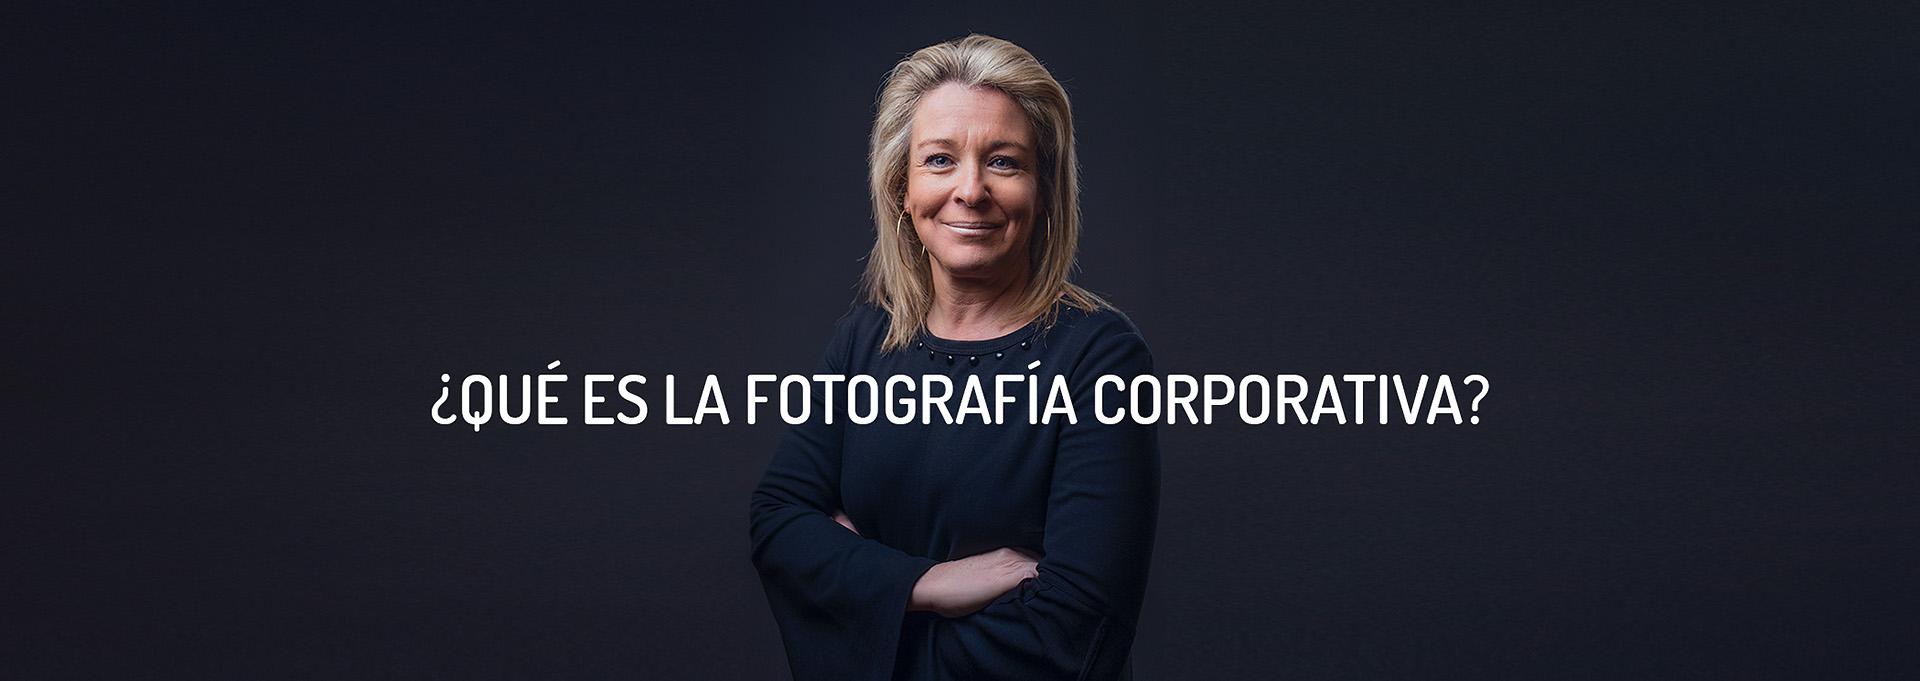 articulo fotografia corporativa